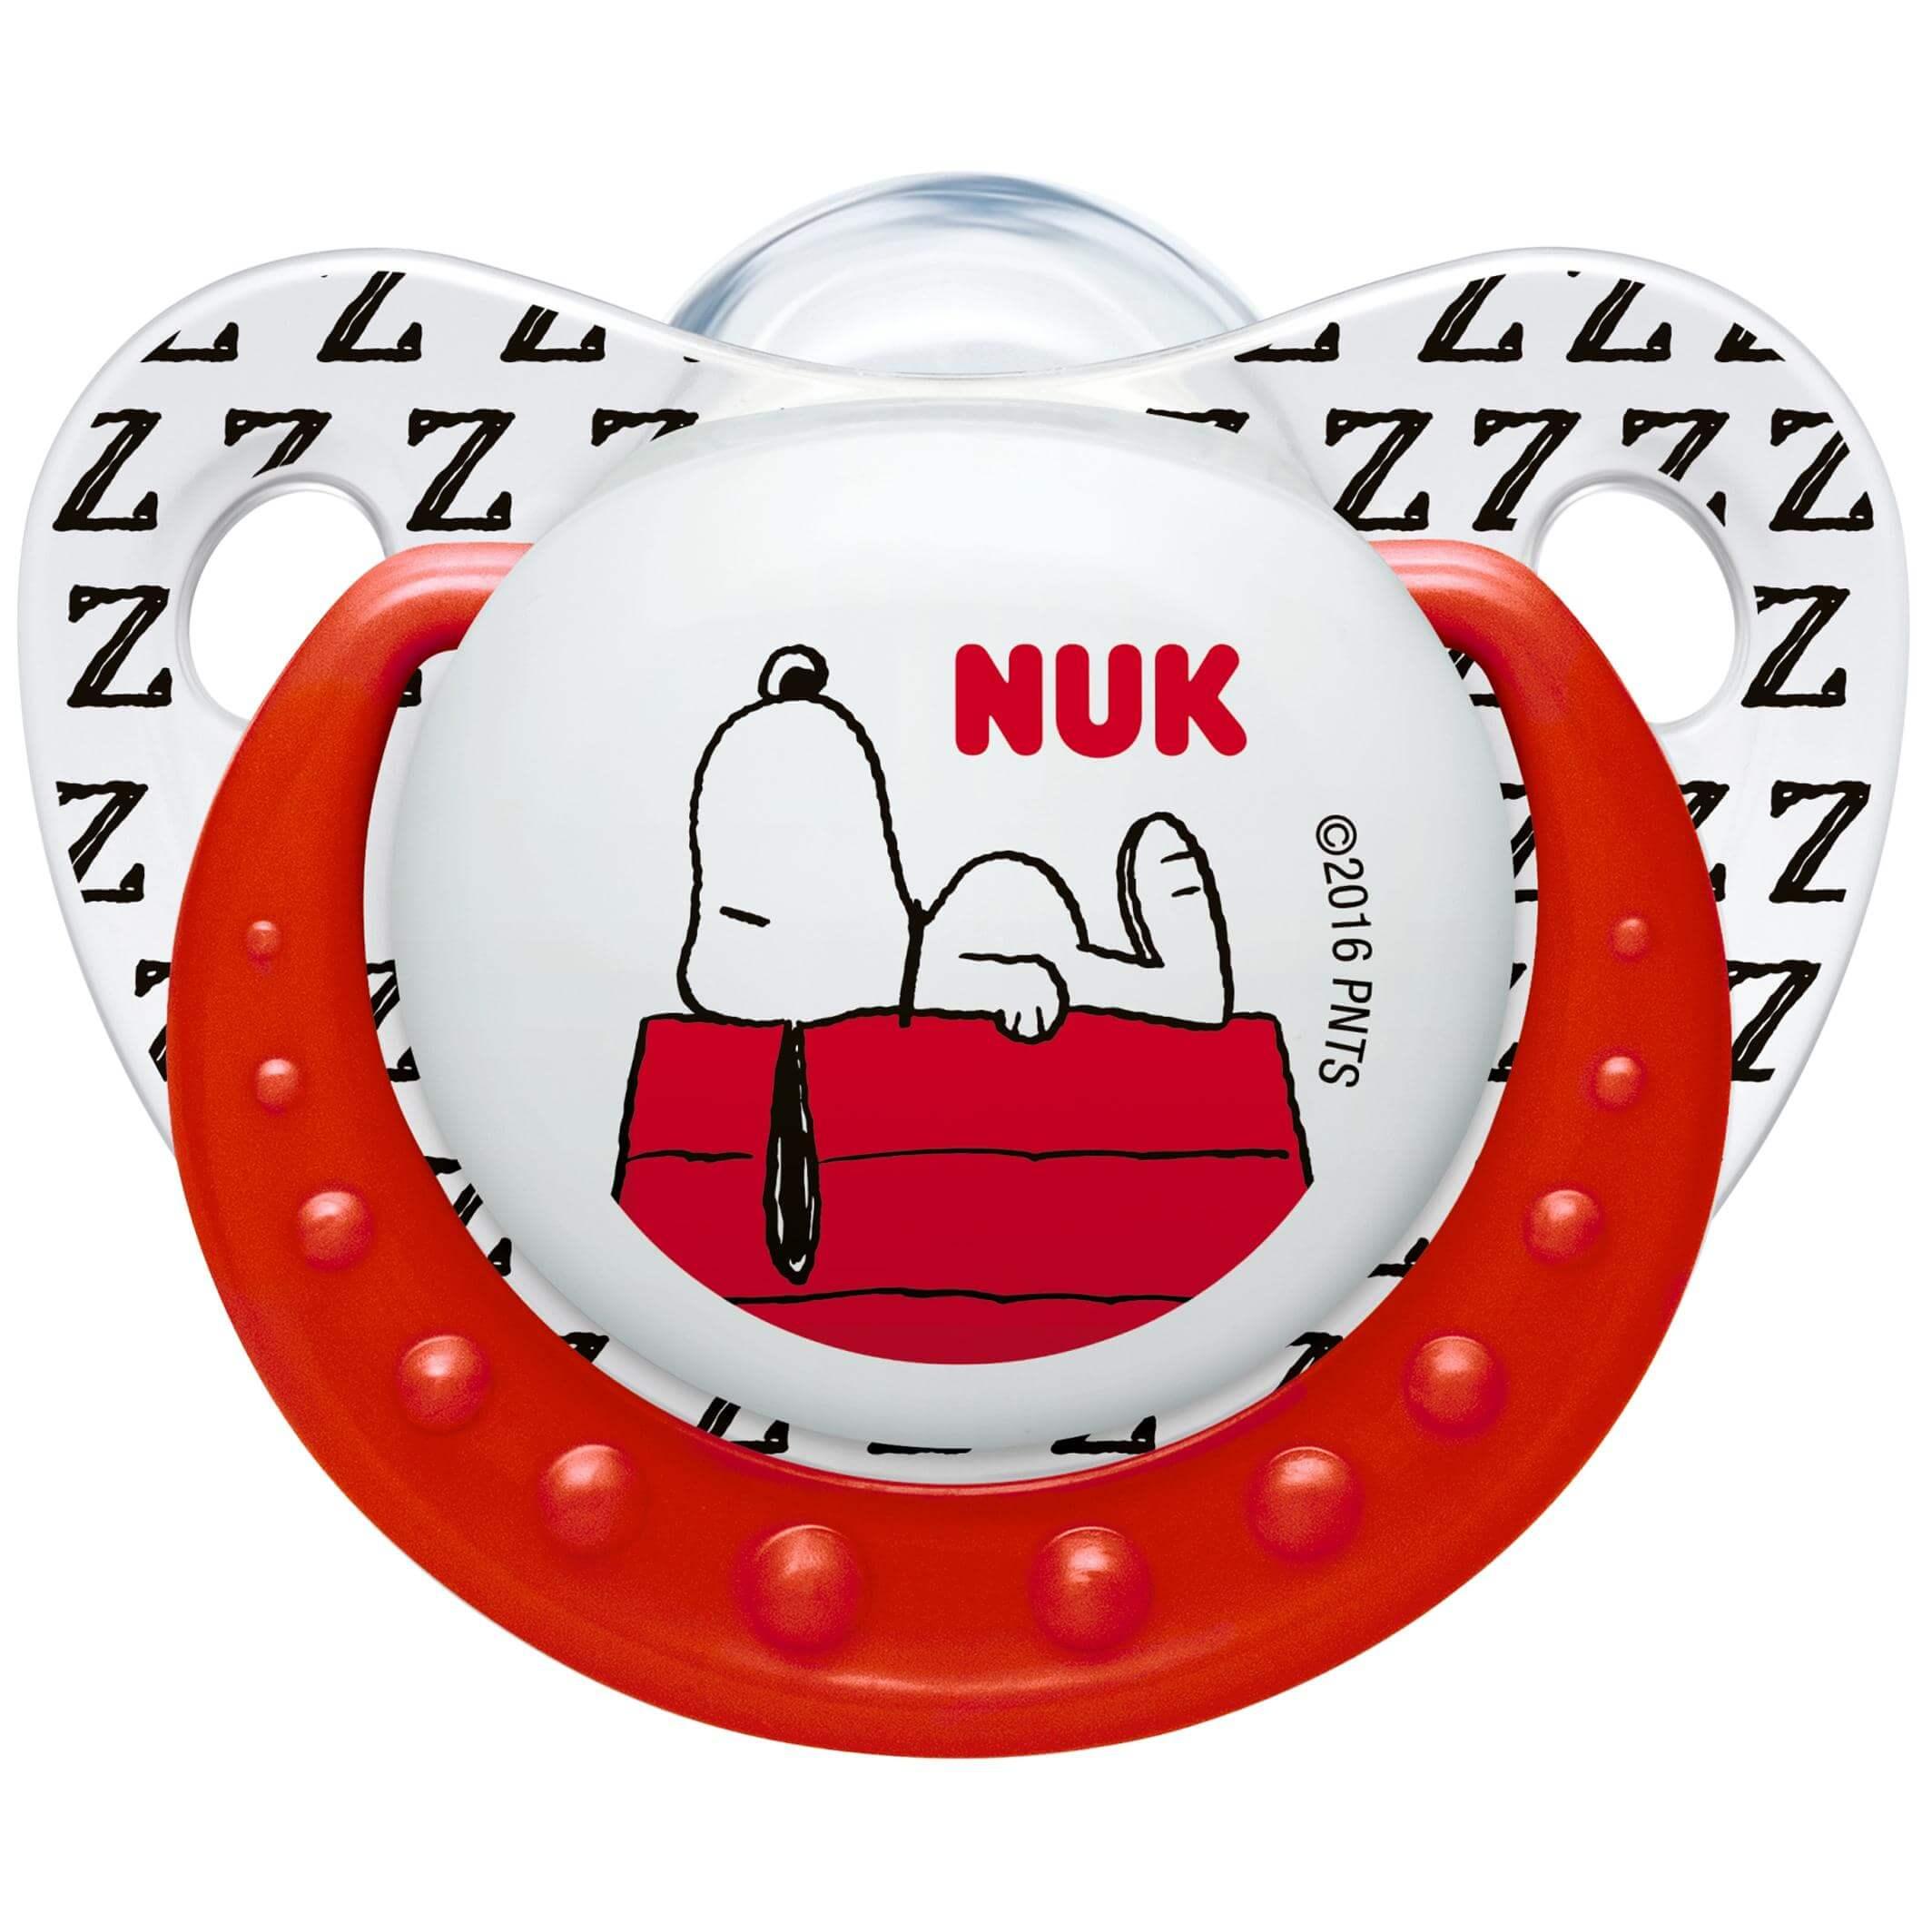 NukTrendline SnoopyPeanuts Πιπίλα Σιλικόνης με Κρίκο Χωρίς BPA Κόκκινο – Μέγεθος 2 (6-18 μηνών)